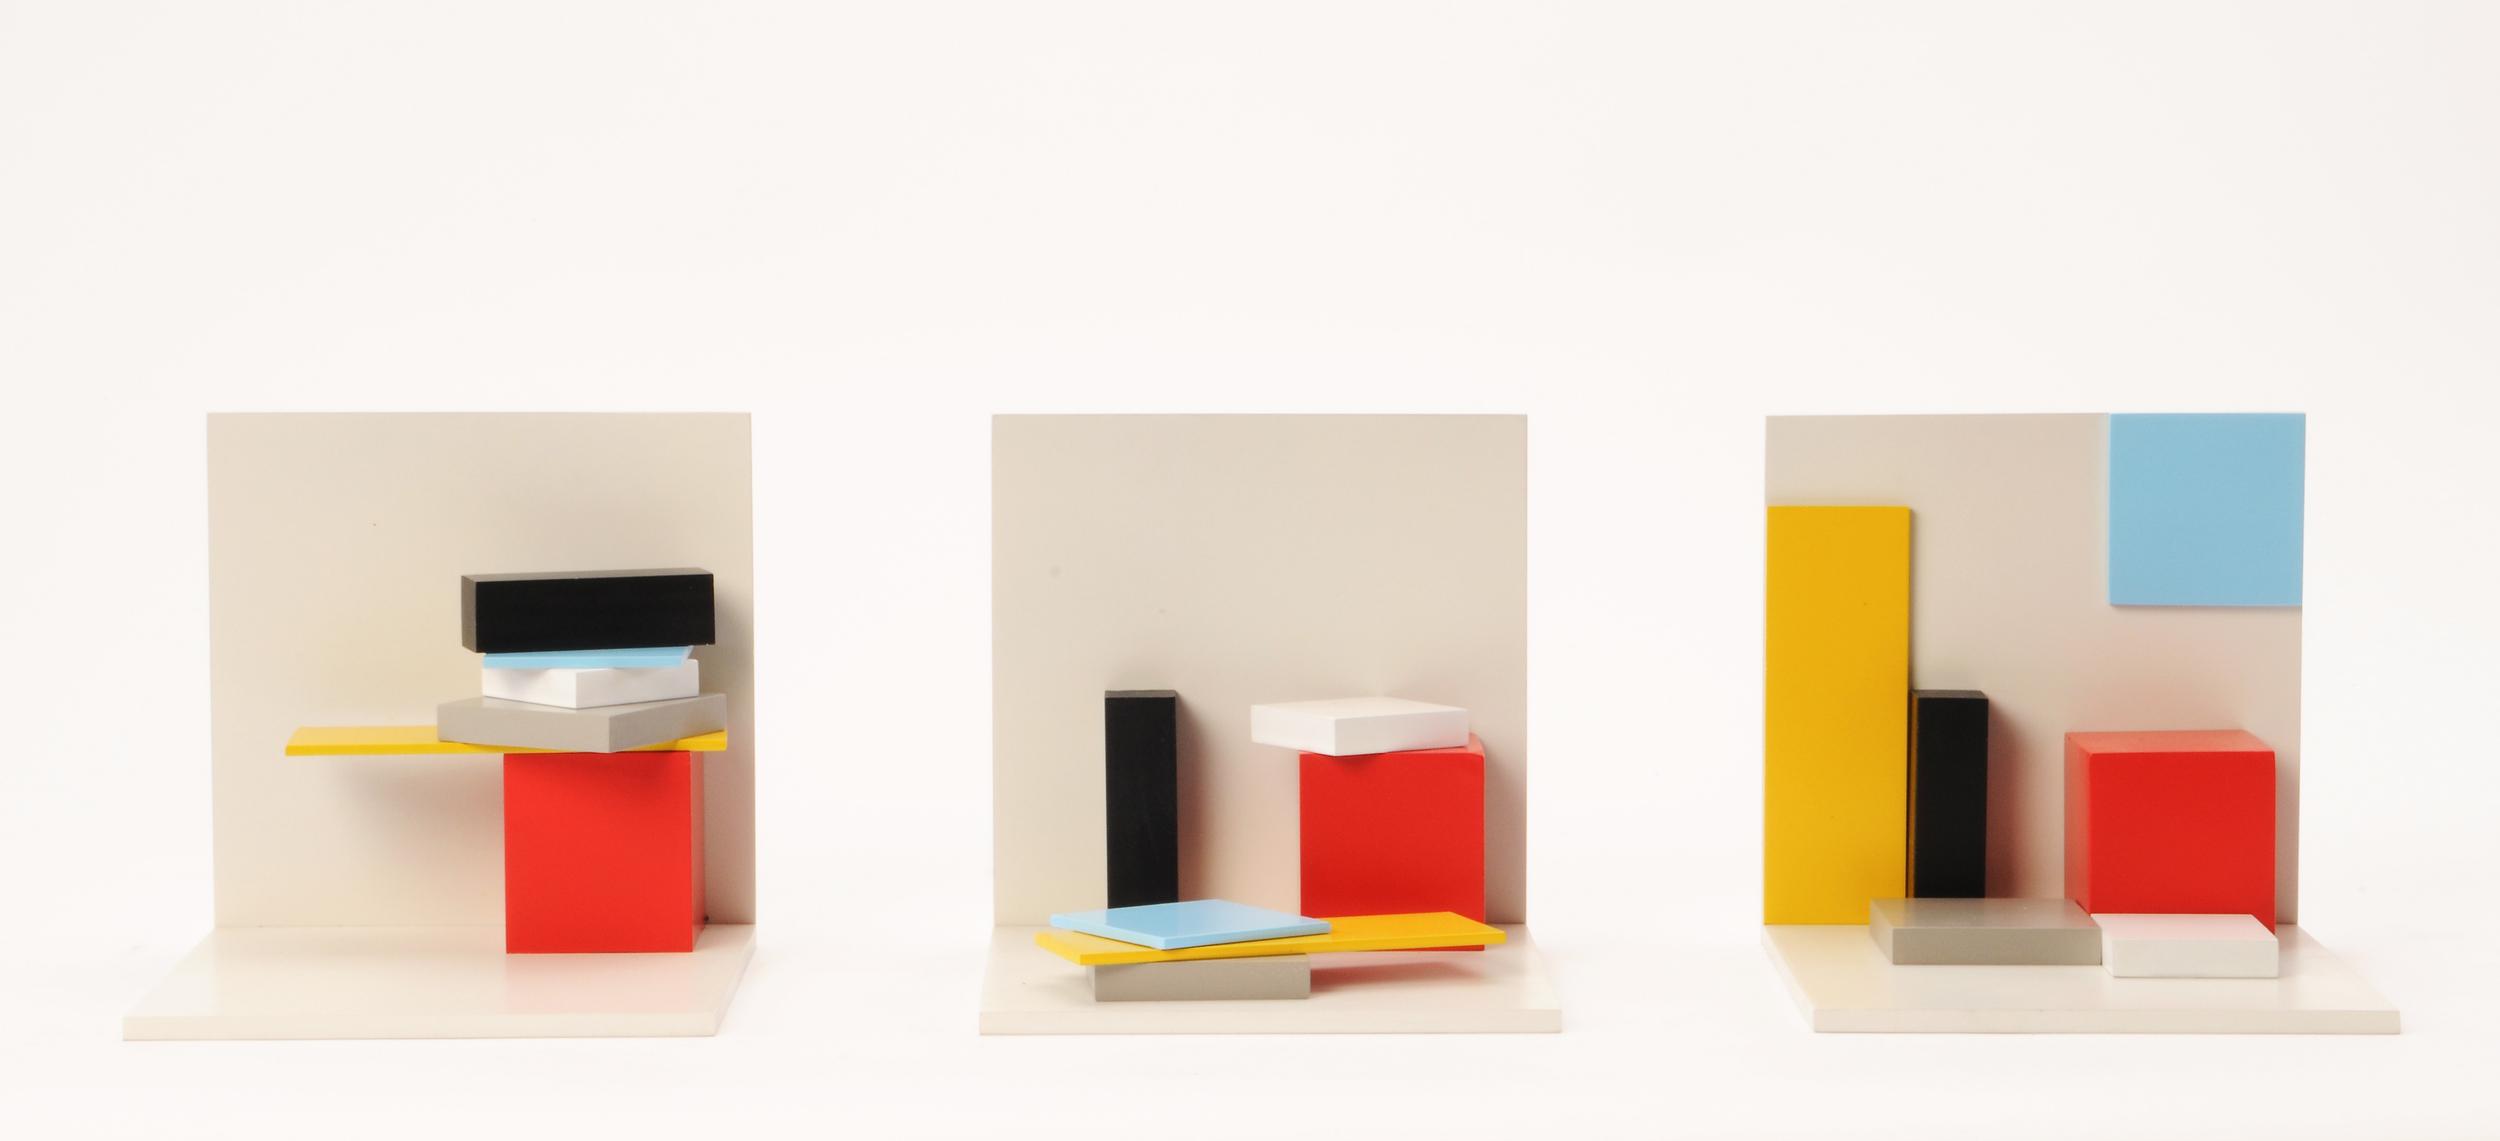 'Studio Day' 2001 (x 3) / Size:15cm x 15cm x 15cm (Total: 50cm variable) Price:$7,500 /  P  urchase